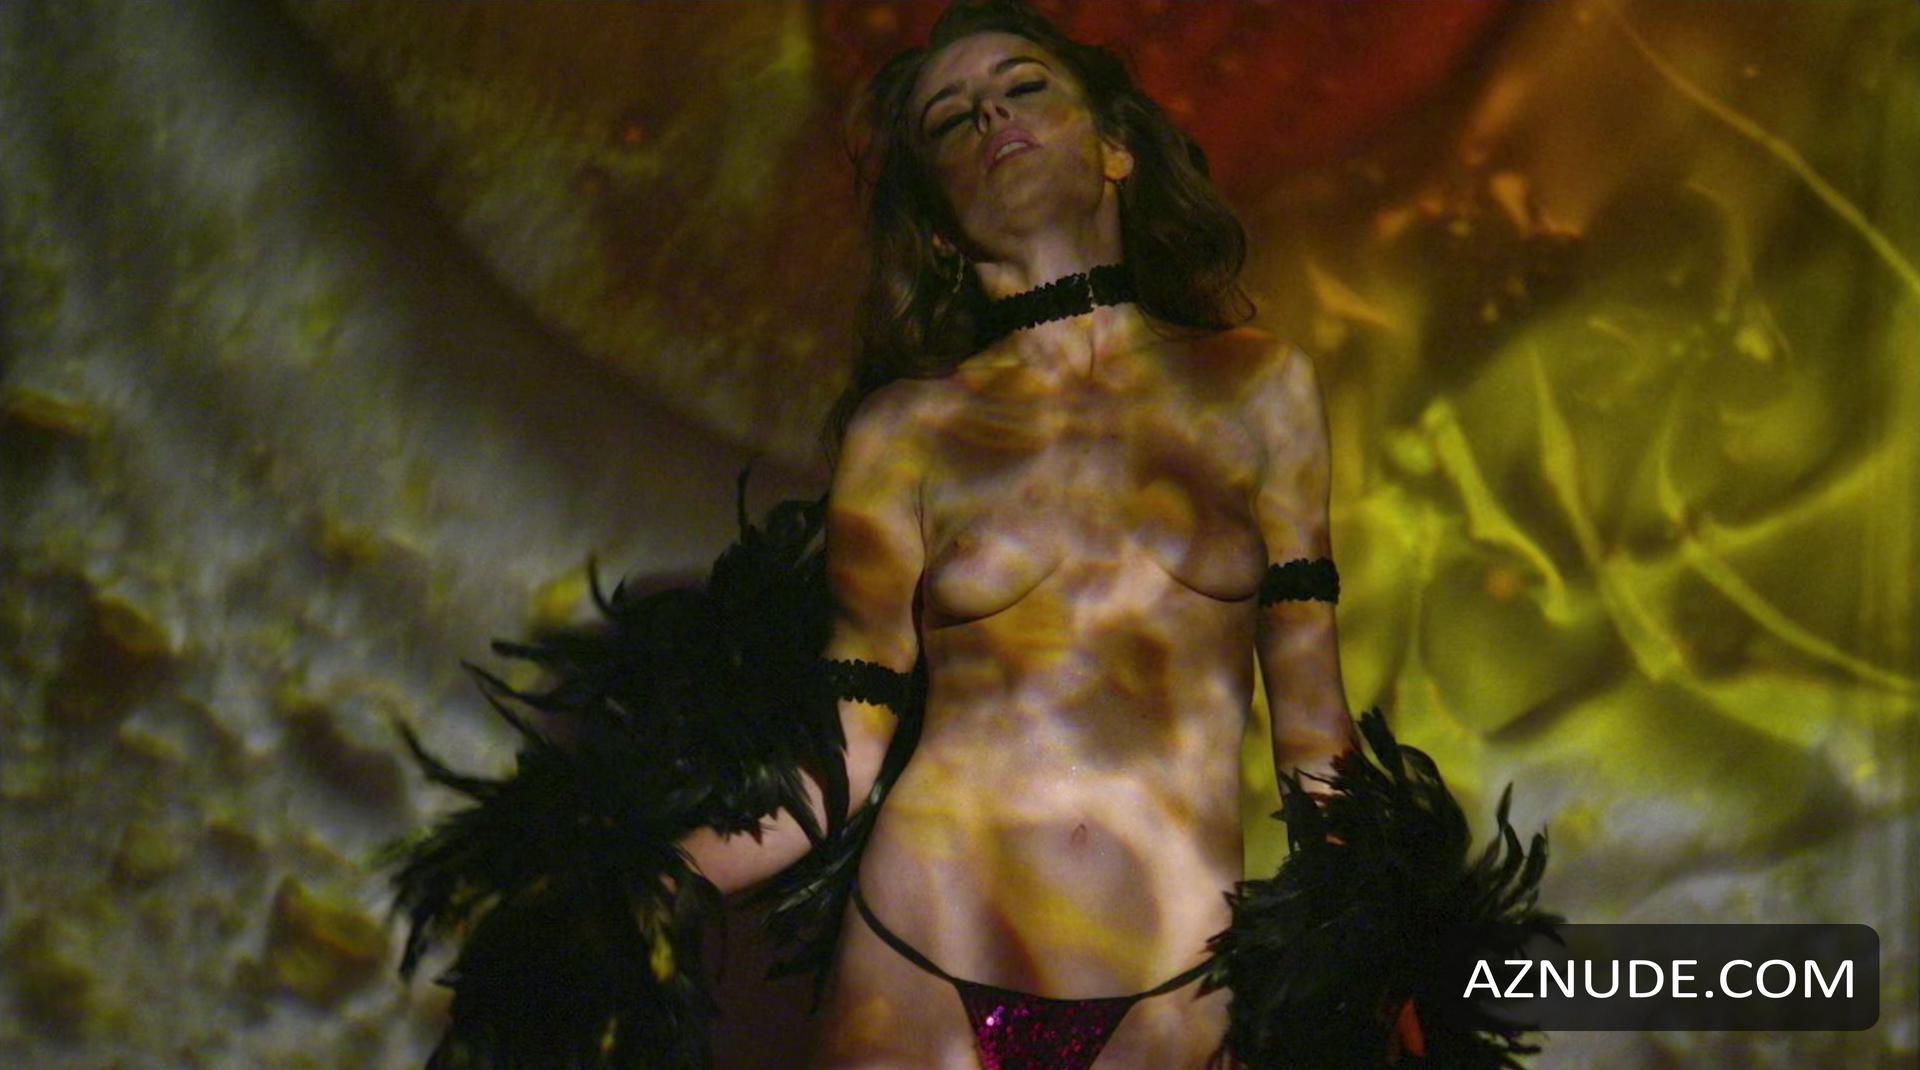 Analeigh tipton nude sex in 039compulsion039 on scandalplanetcom - 3 part 6